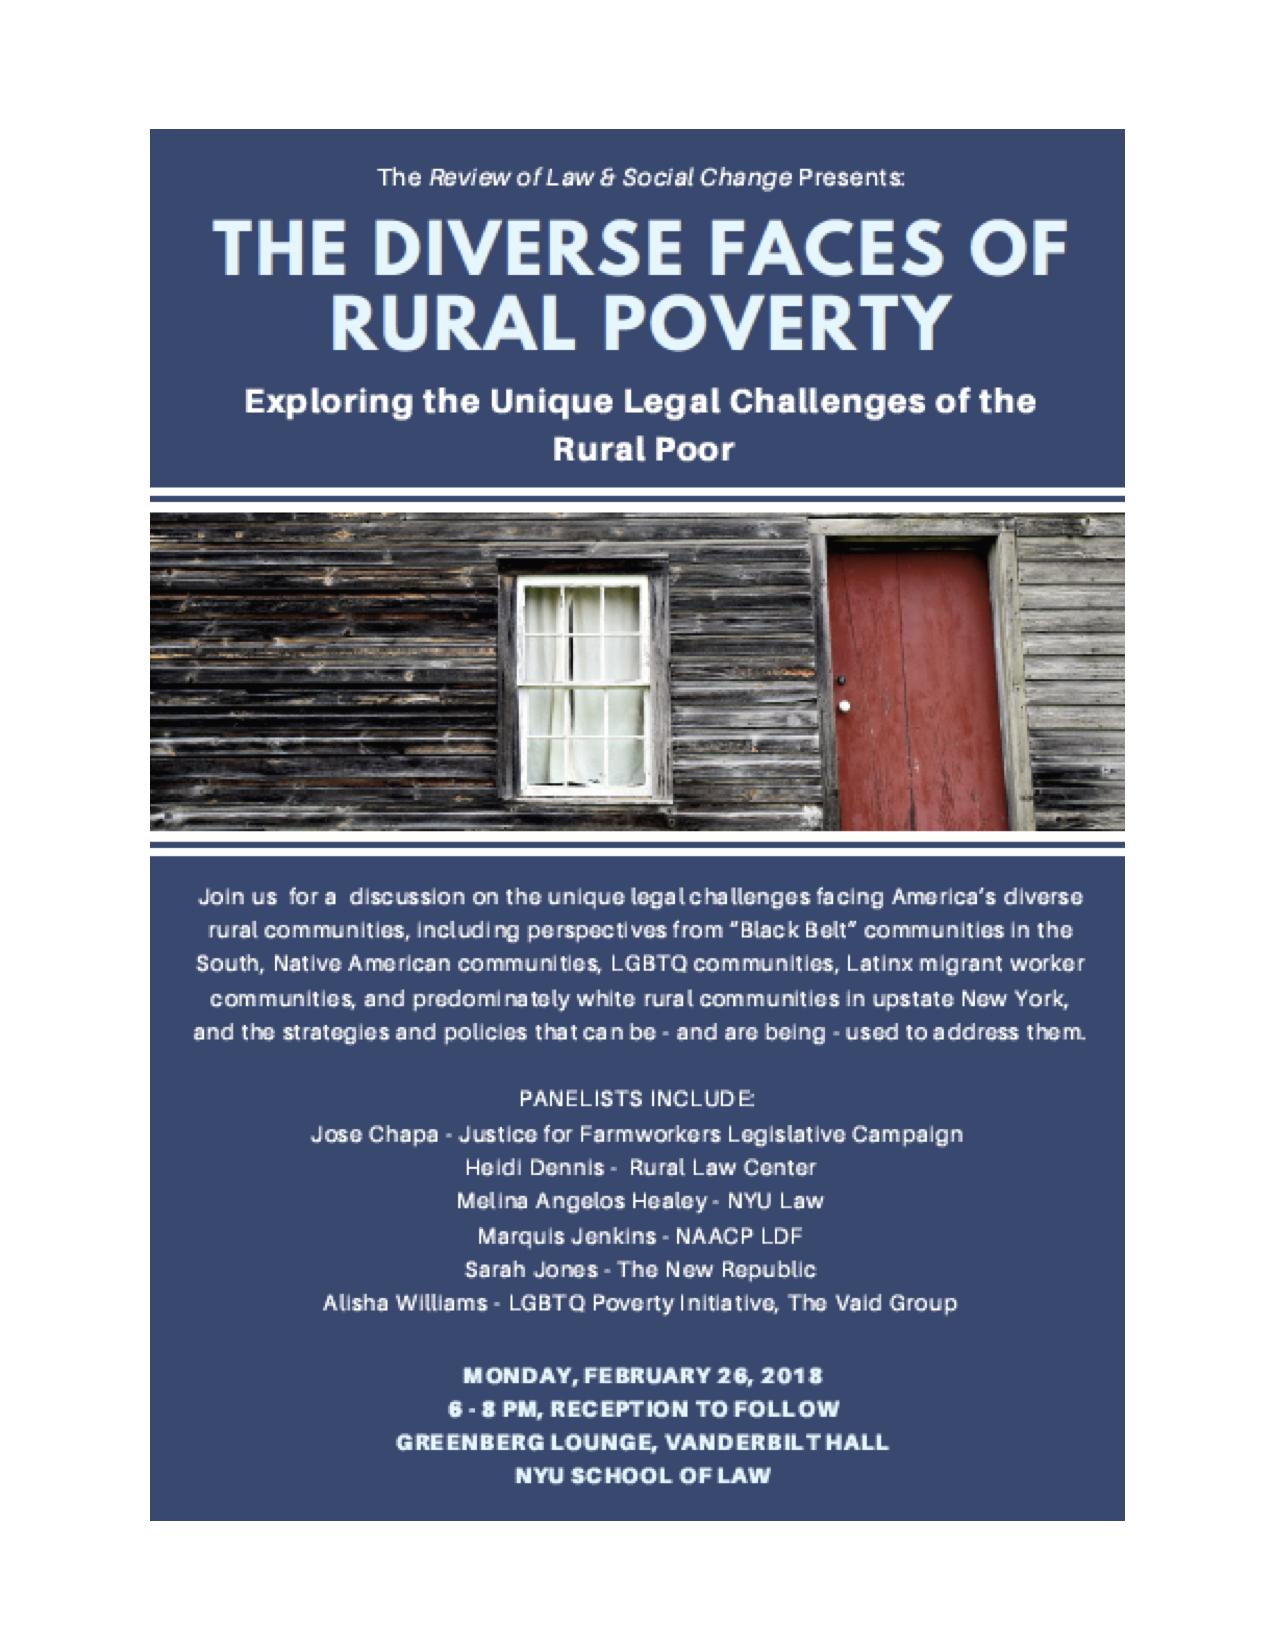 Spring 2018 Colloquium: The Diverse Faces of Rural Poverty